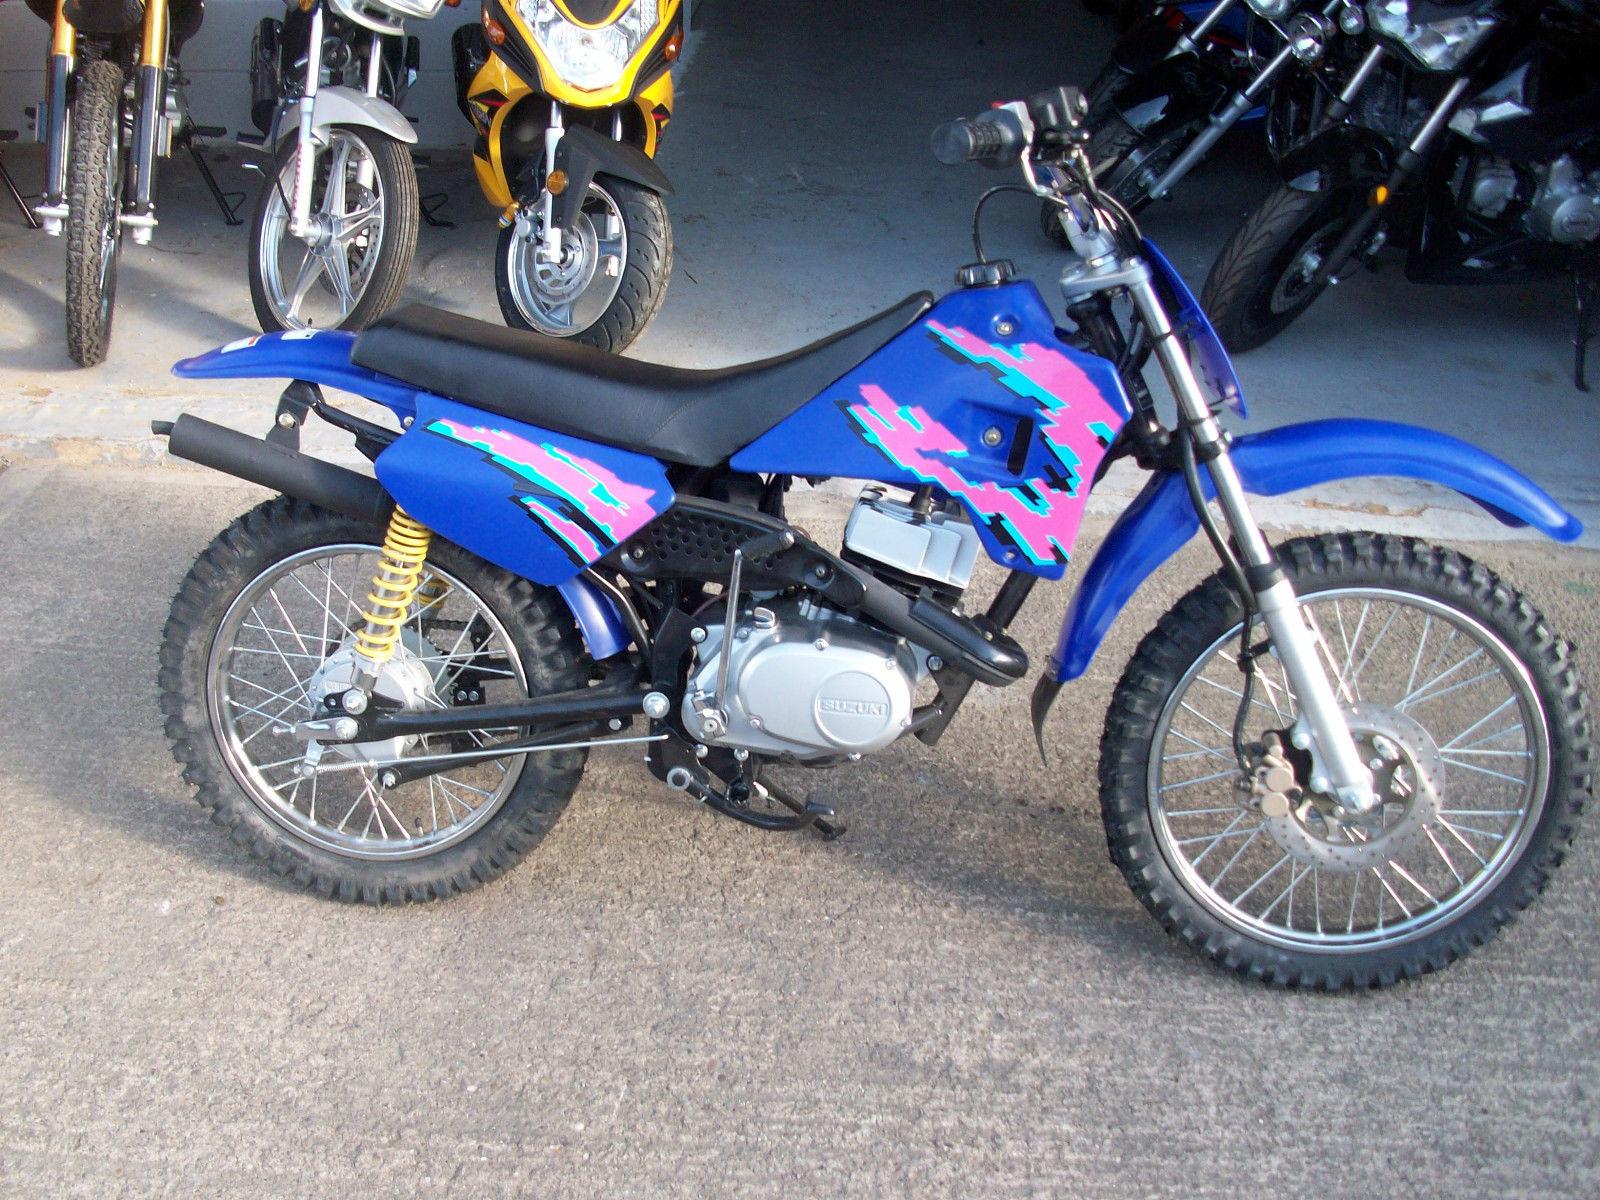 Suzuki Cougar Cc Dirt Bike